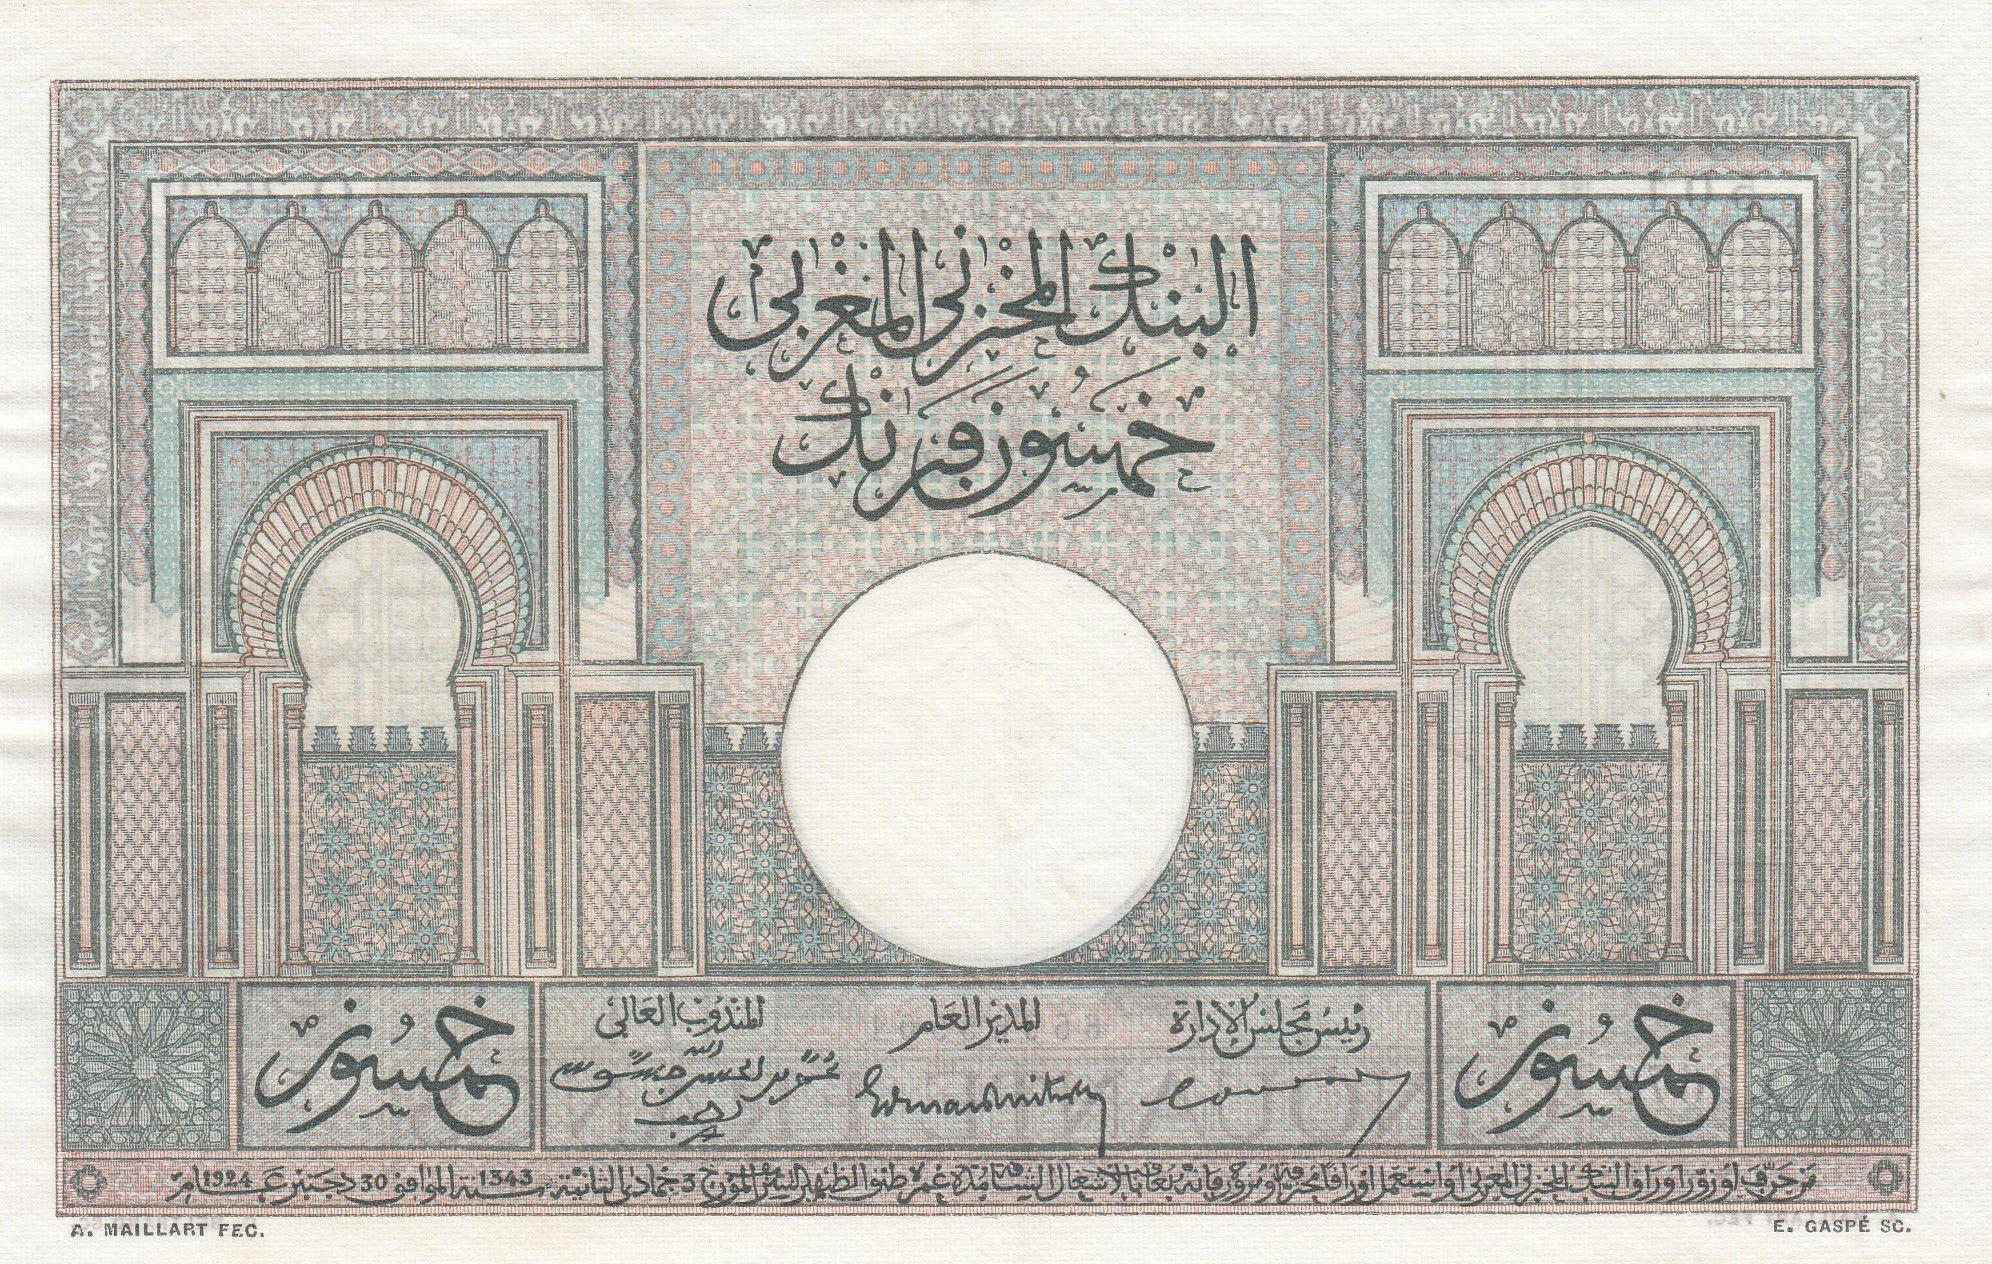 Maroc 50 Francs 28-10-1947 -  Grand Format - SUP  - Série Q.2679 - P.21